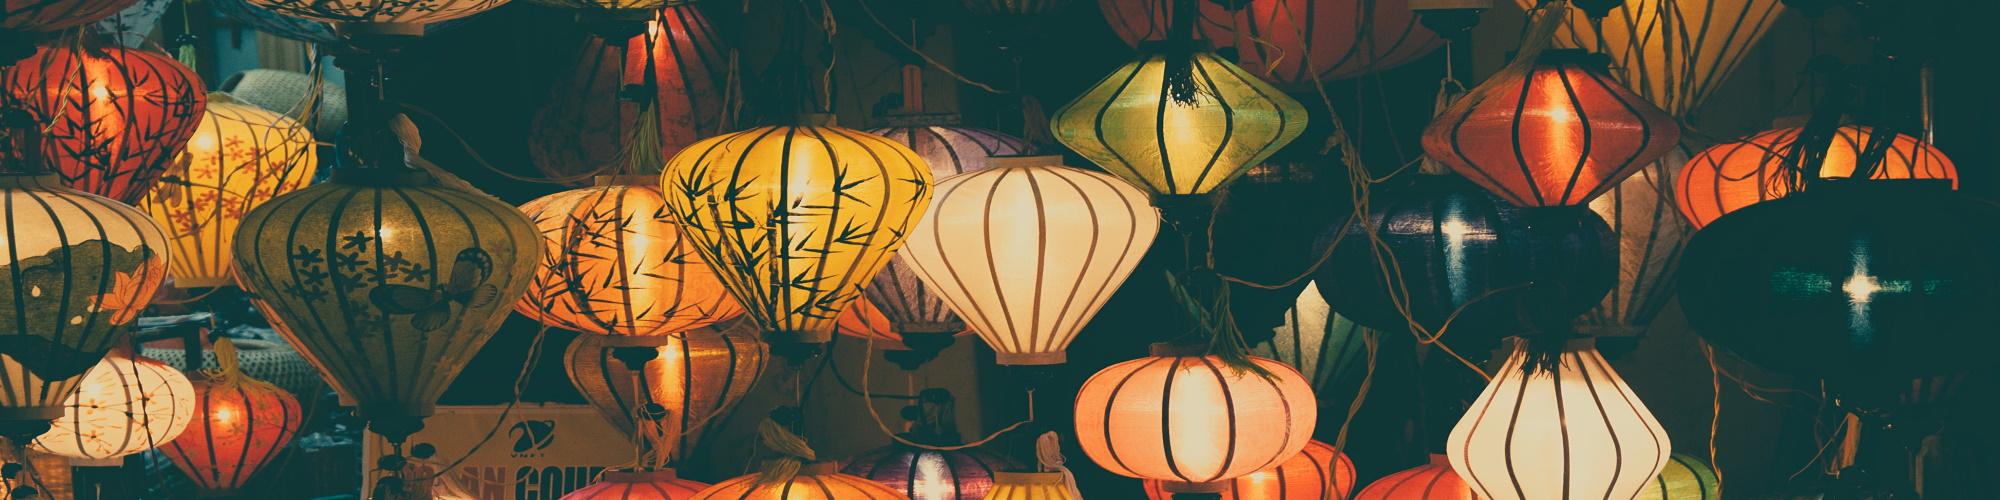 festivals vietnam